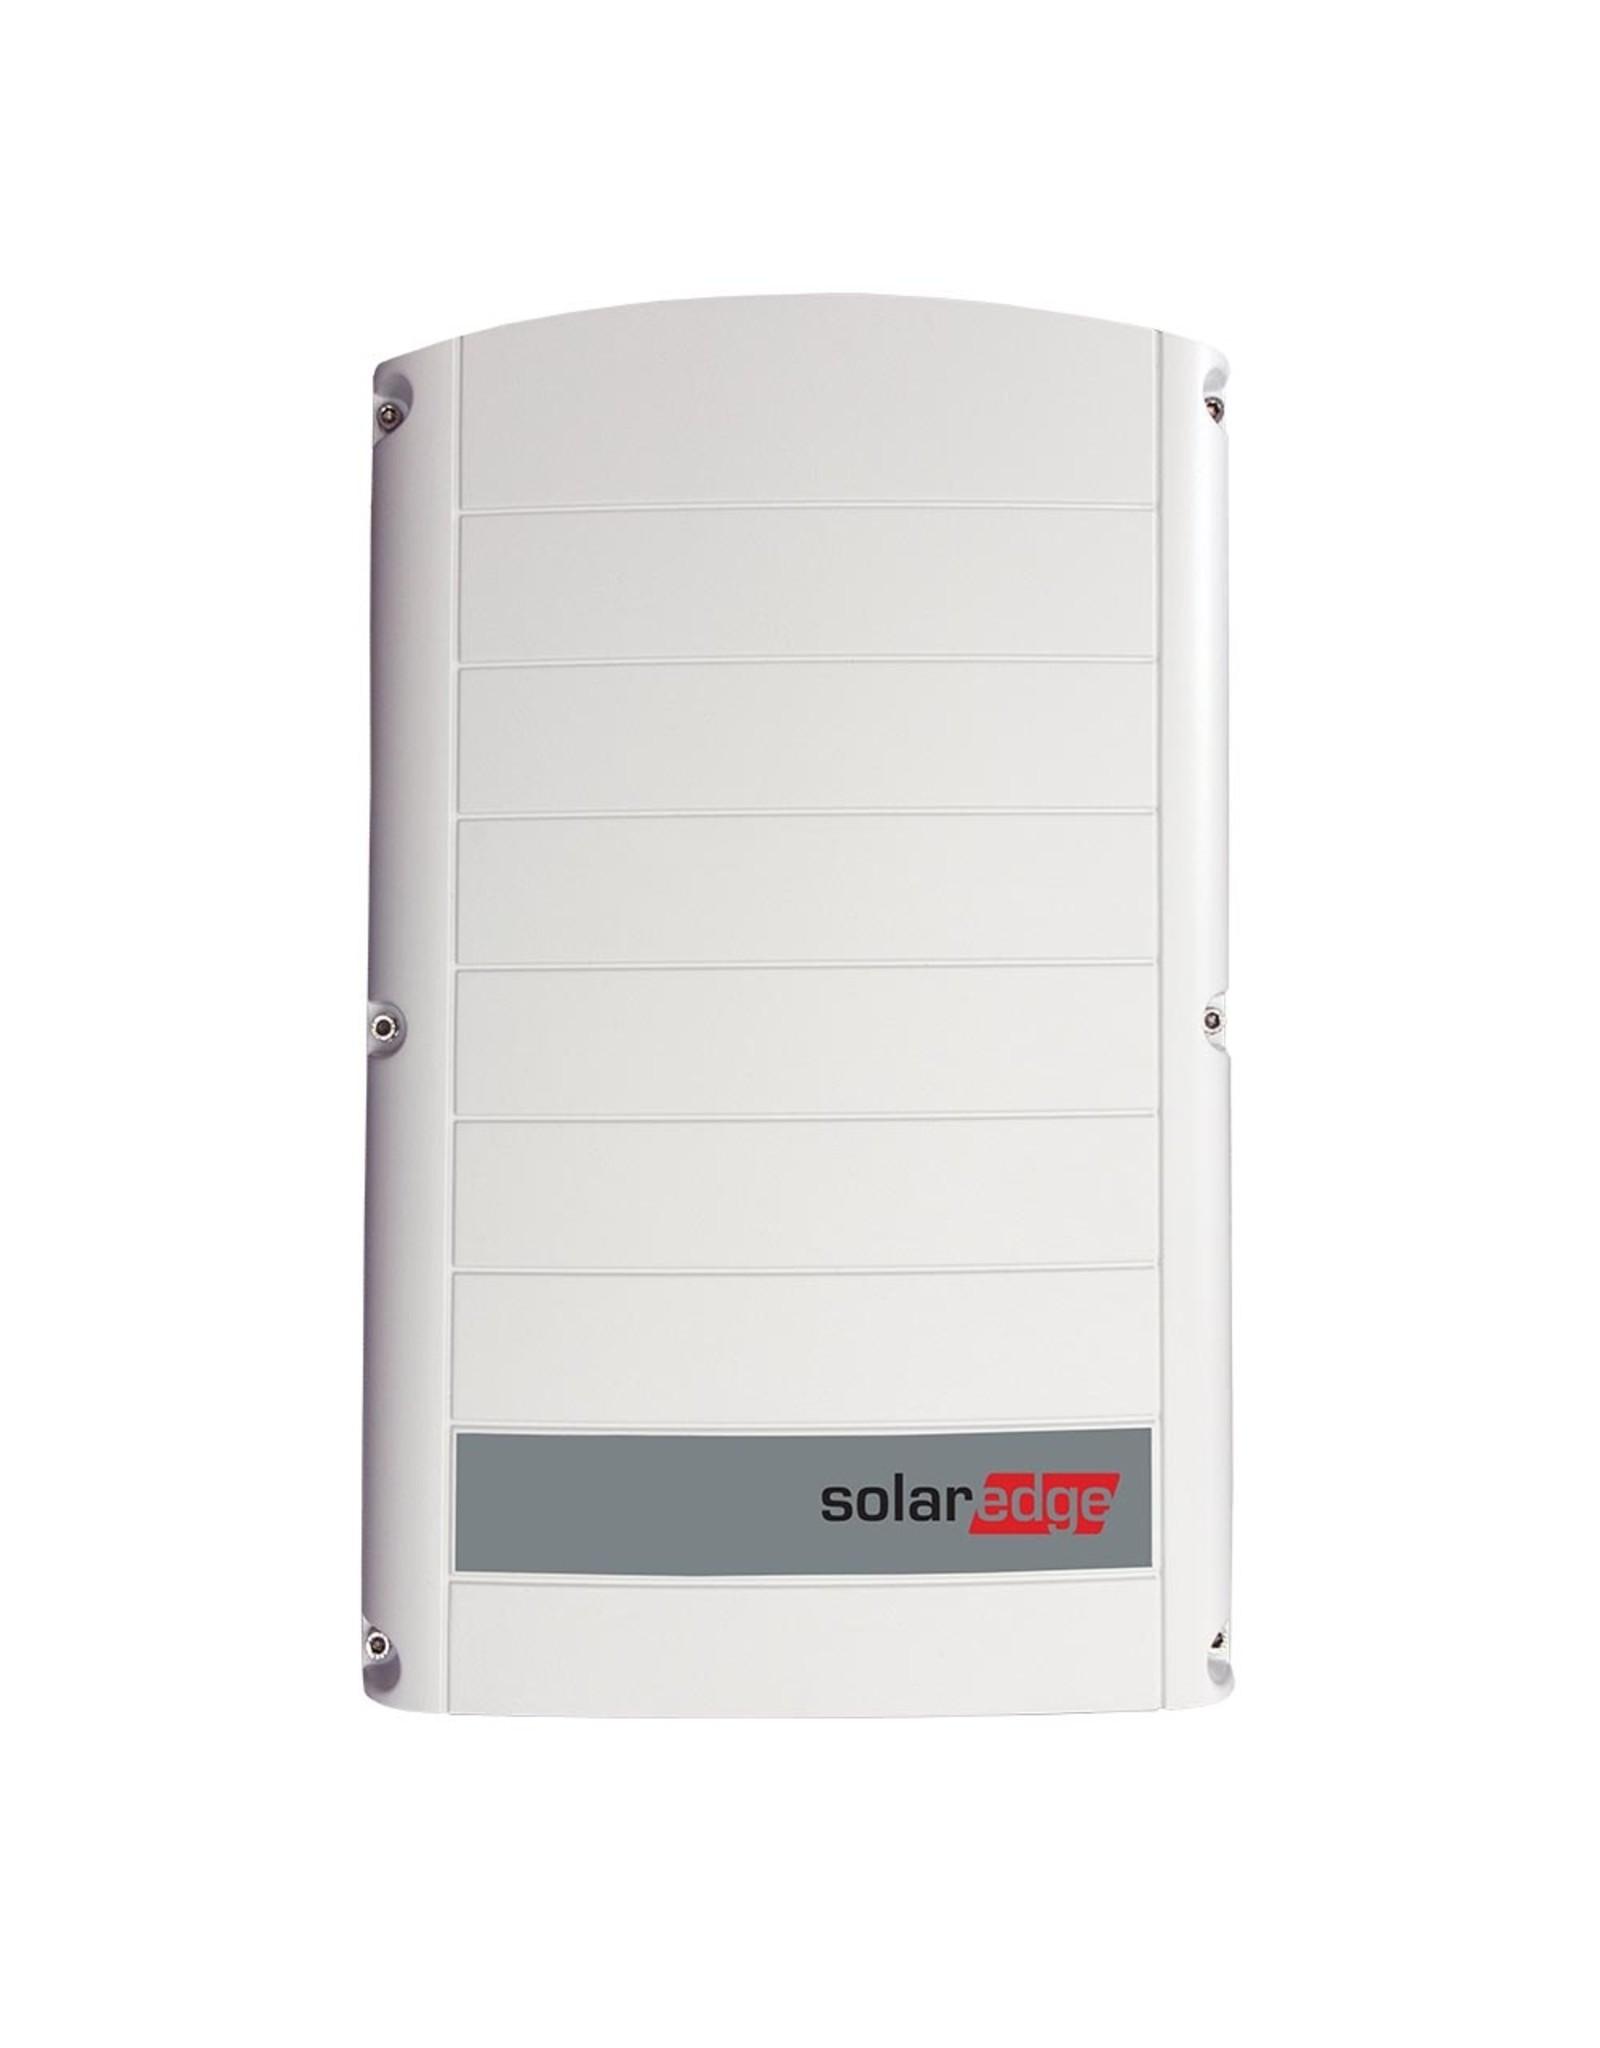 SolarEdge SolarEdge SE3K driefase omvormer 3.0 kW - met SetApp configuratie